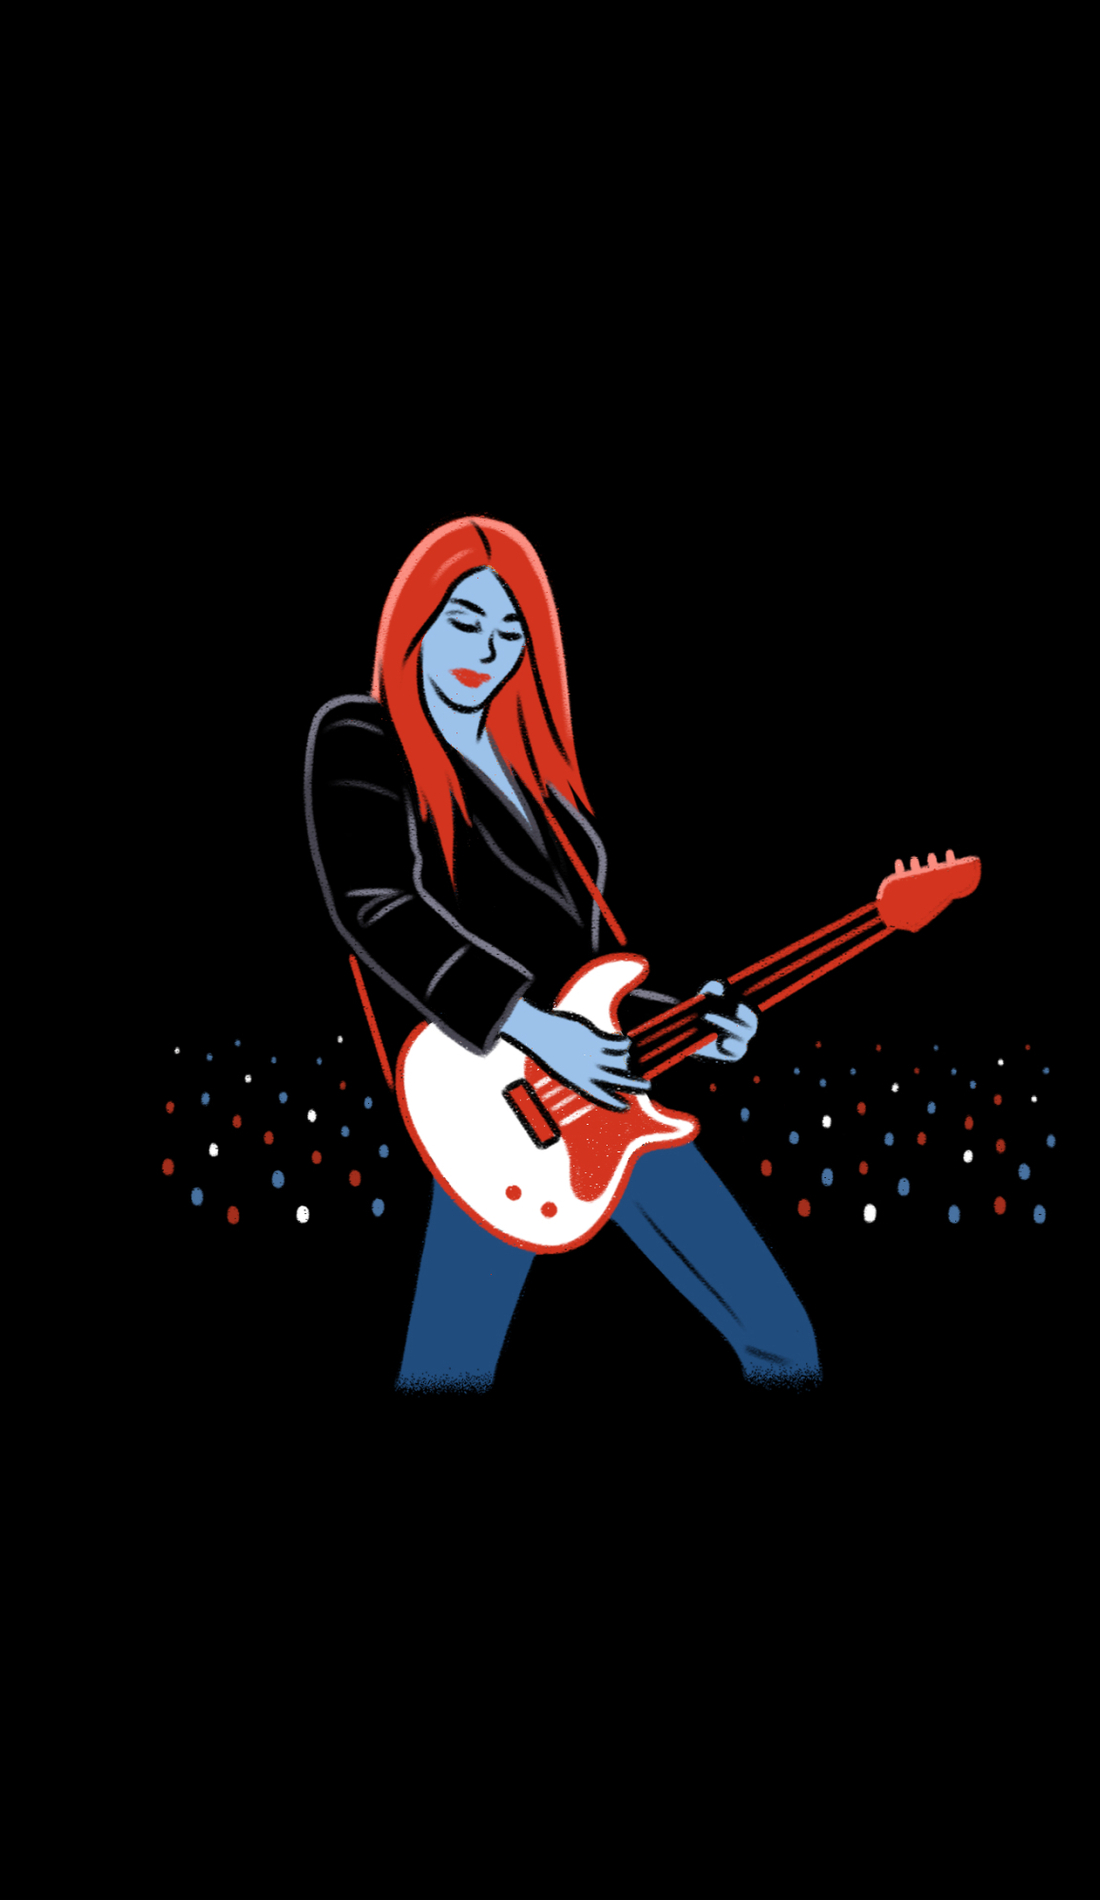 A Breakaway Music Festival - Grand Rapids live event